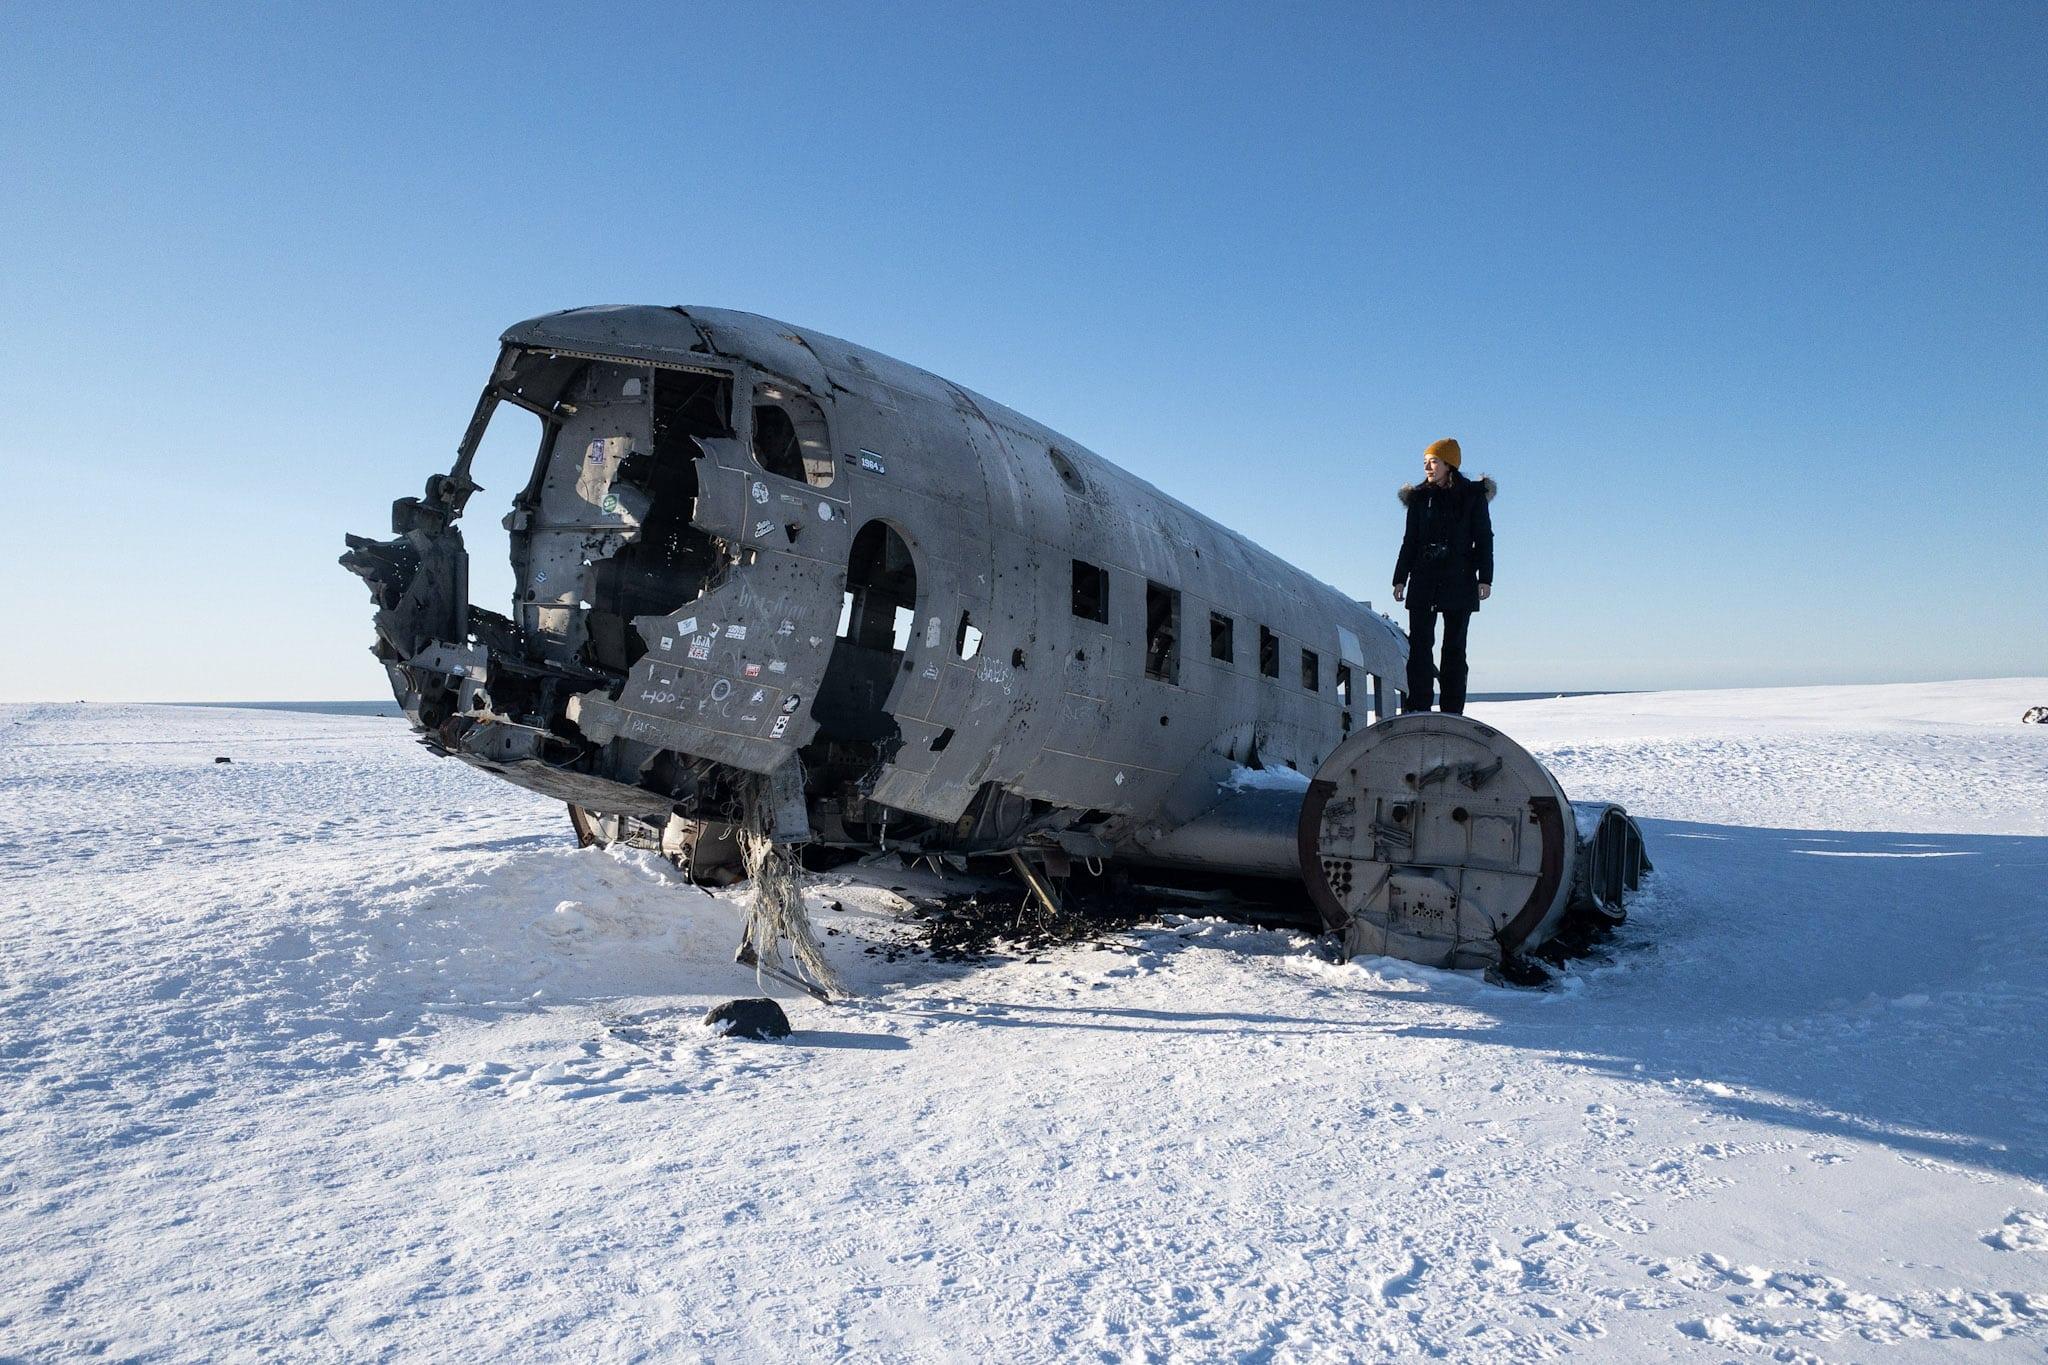 Iceland Sólheimasandur-Plane Wreck Photography